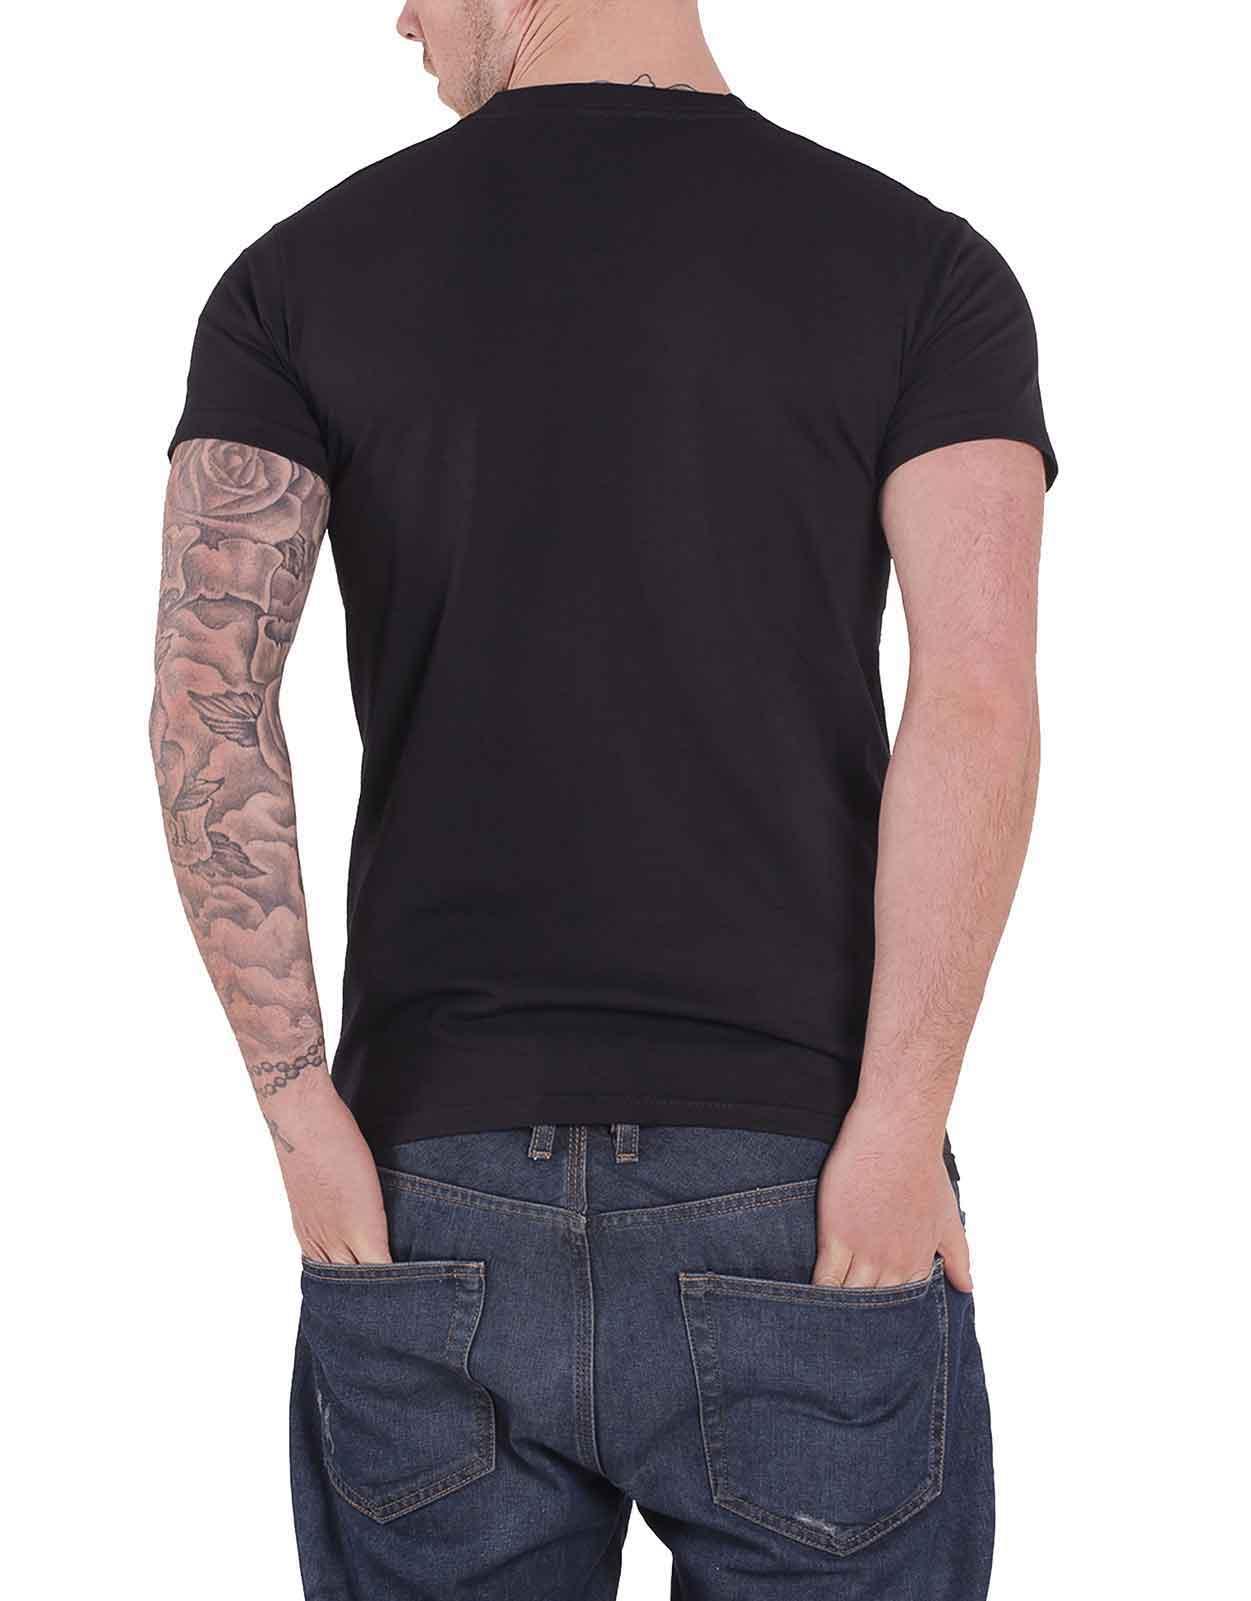 Officiel-Metallica-T-shirt-filaire-justice-for-all-RTL-Band-Logo-Homme-Nouveau miniature 15